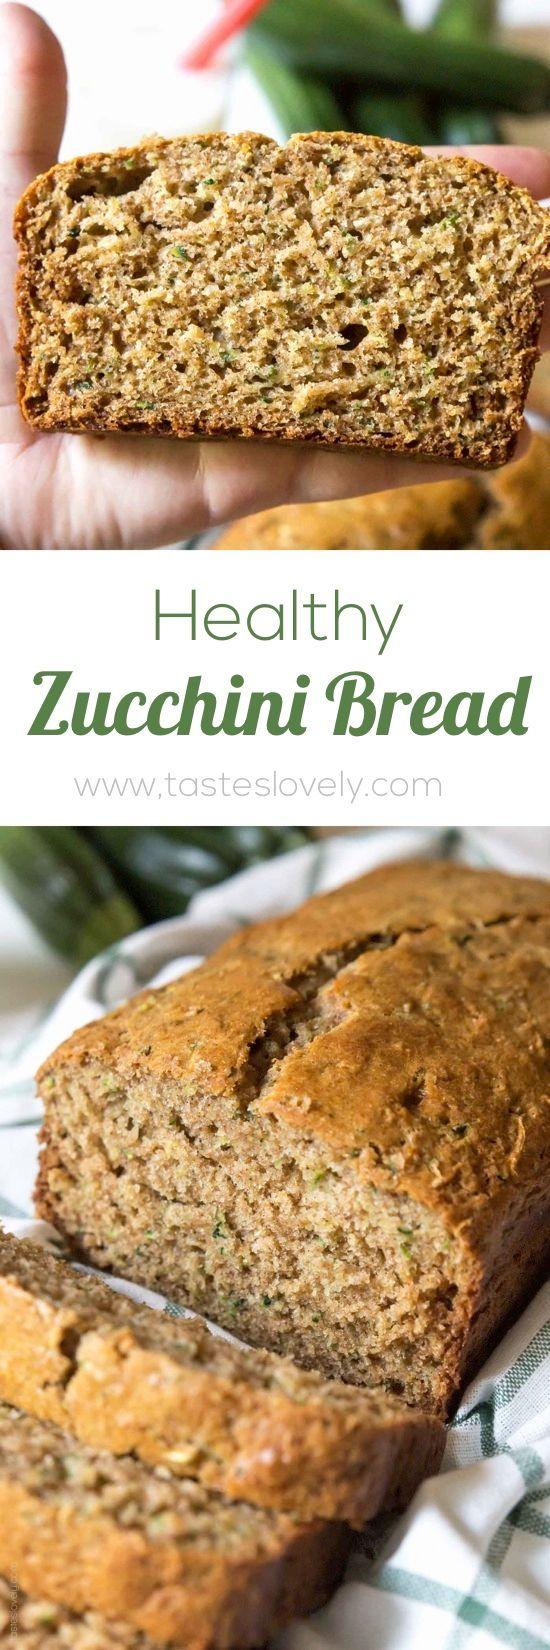 healthy zucchini bread  tastes lovely  zucchini bread